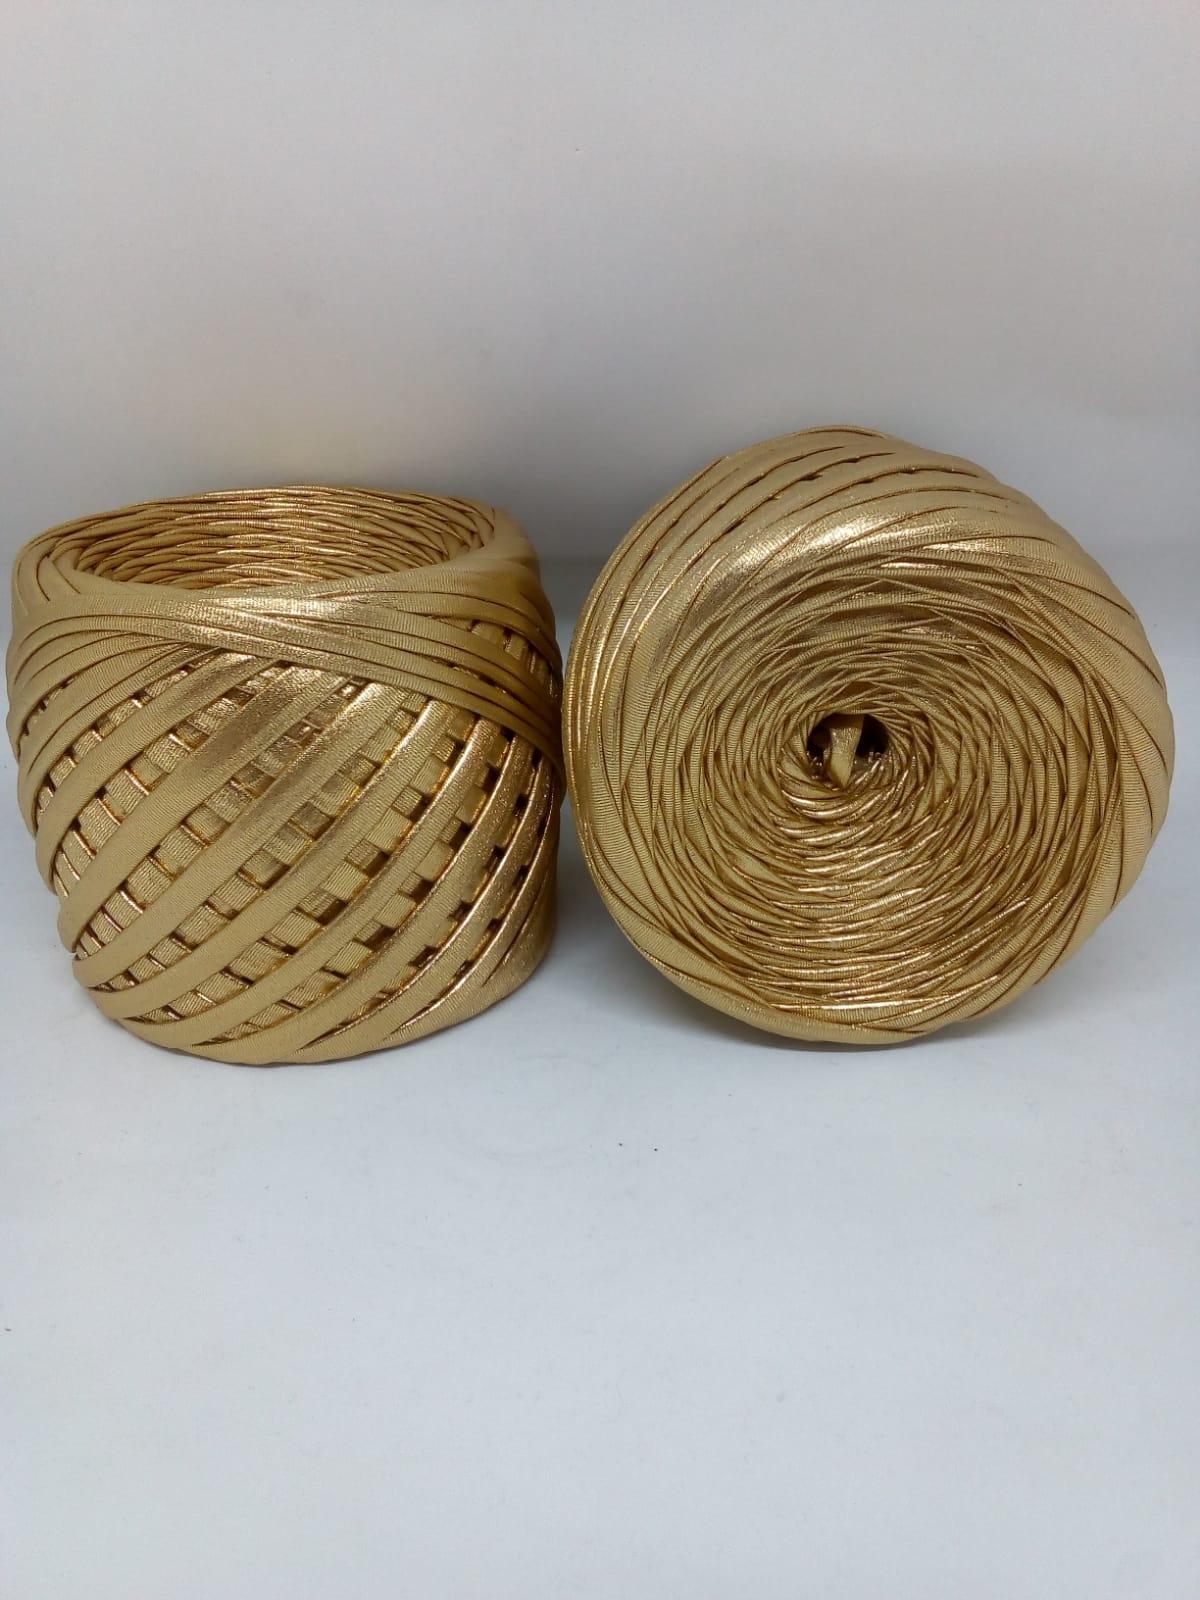 Maccaroni Metallic (Маккарони металика) 4 - золото заказать в Беларуси